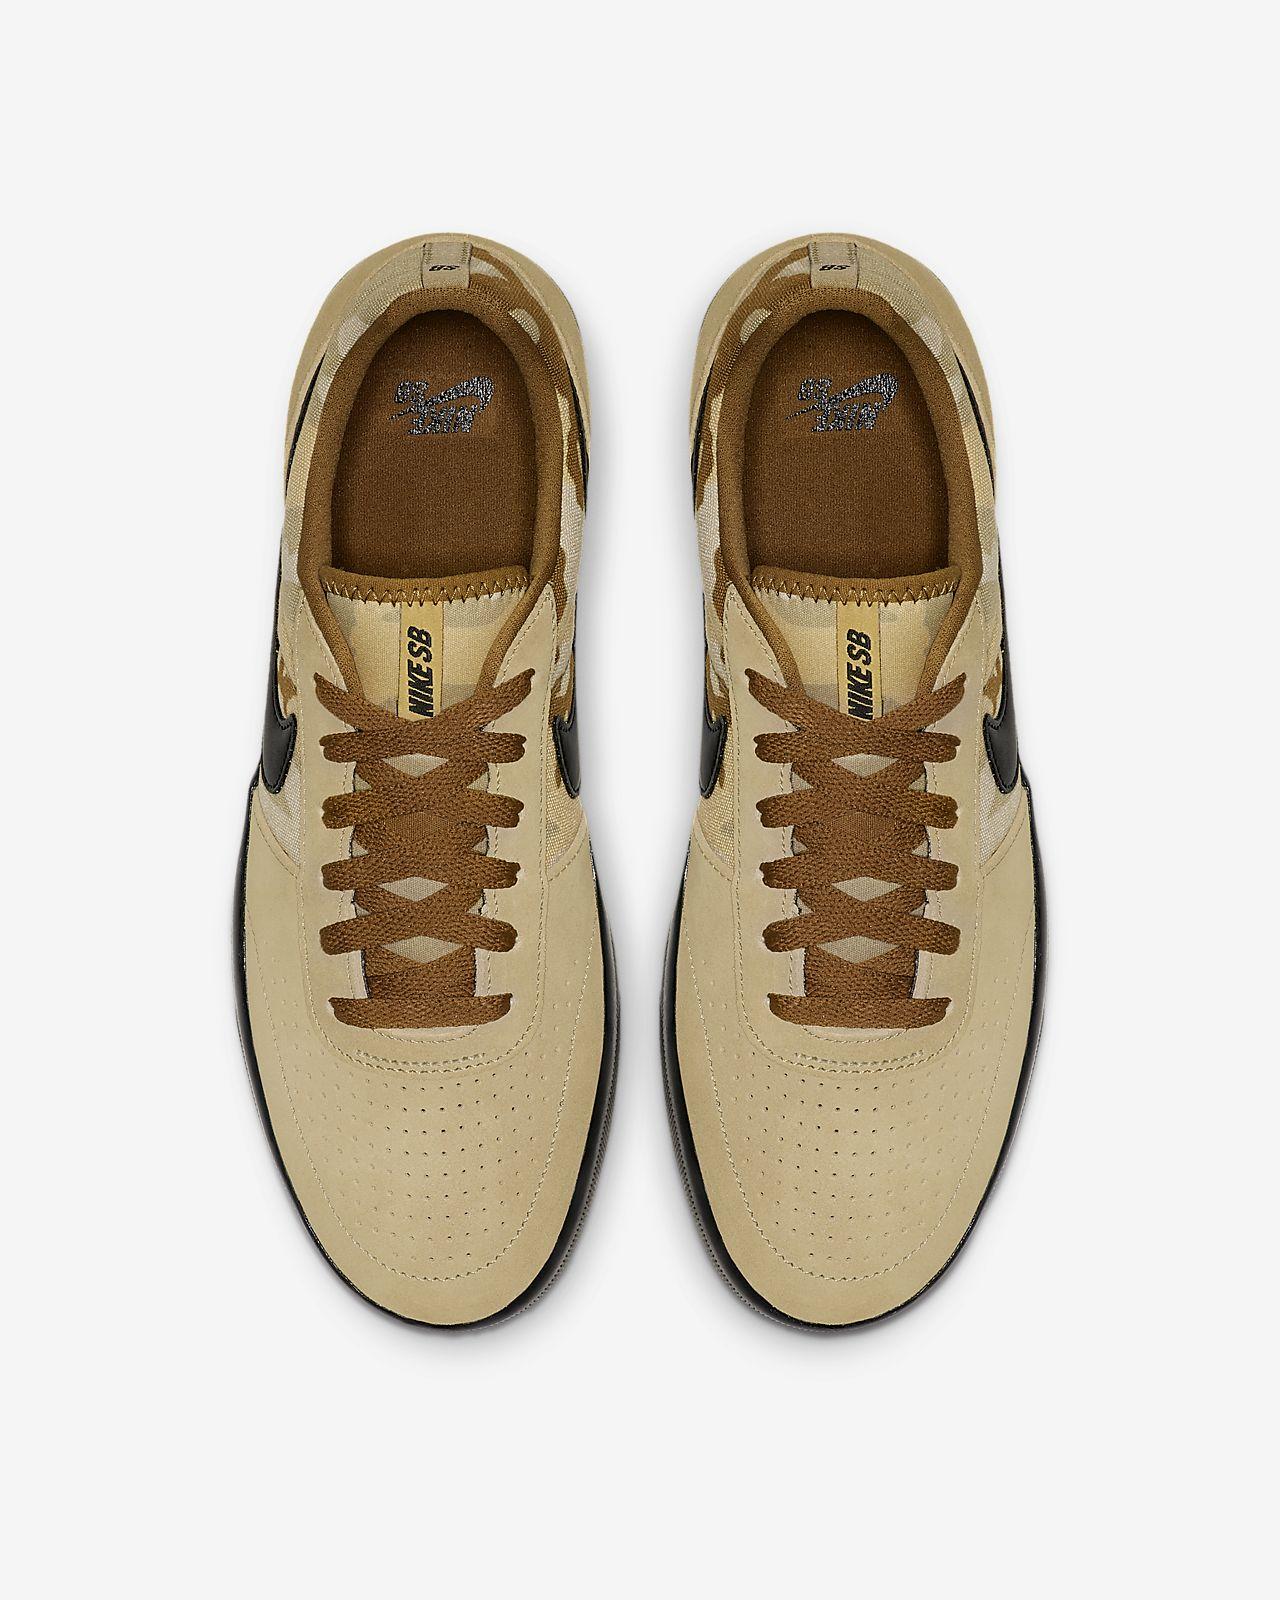 official photos 439f6 457cf ... Nike SB Team Classic Men s Skate Shoe